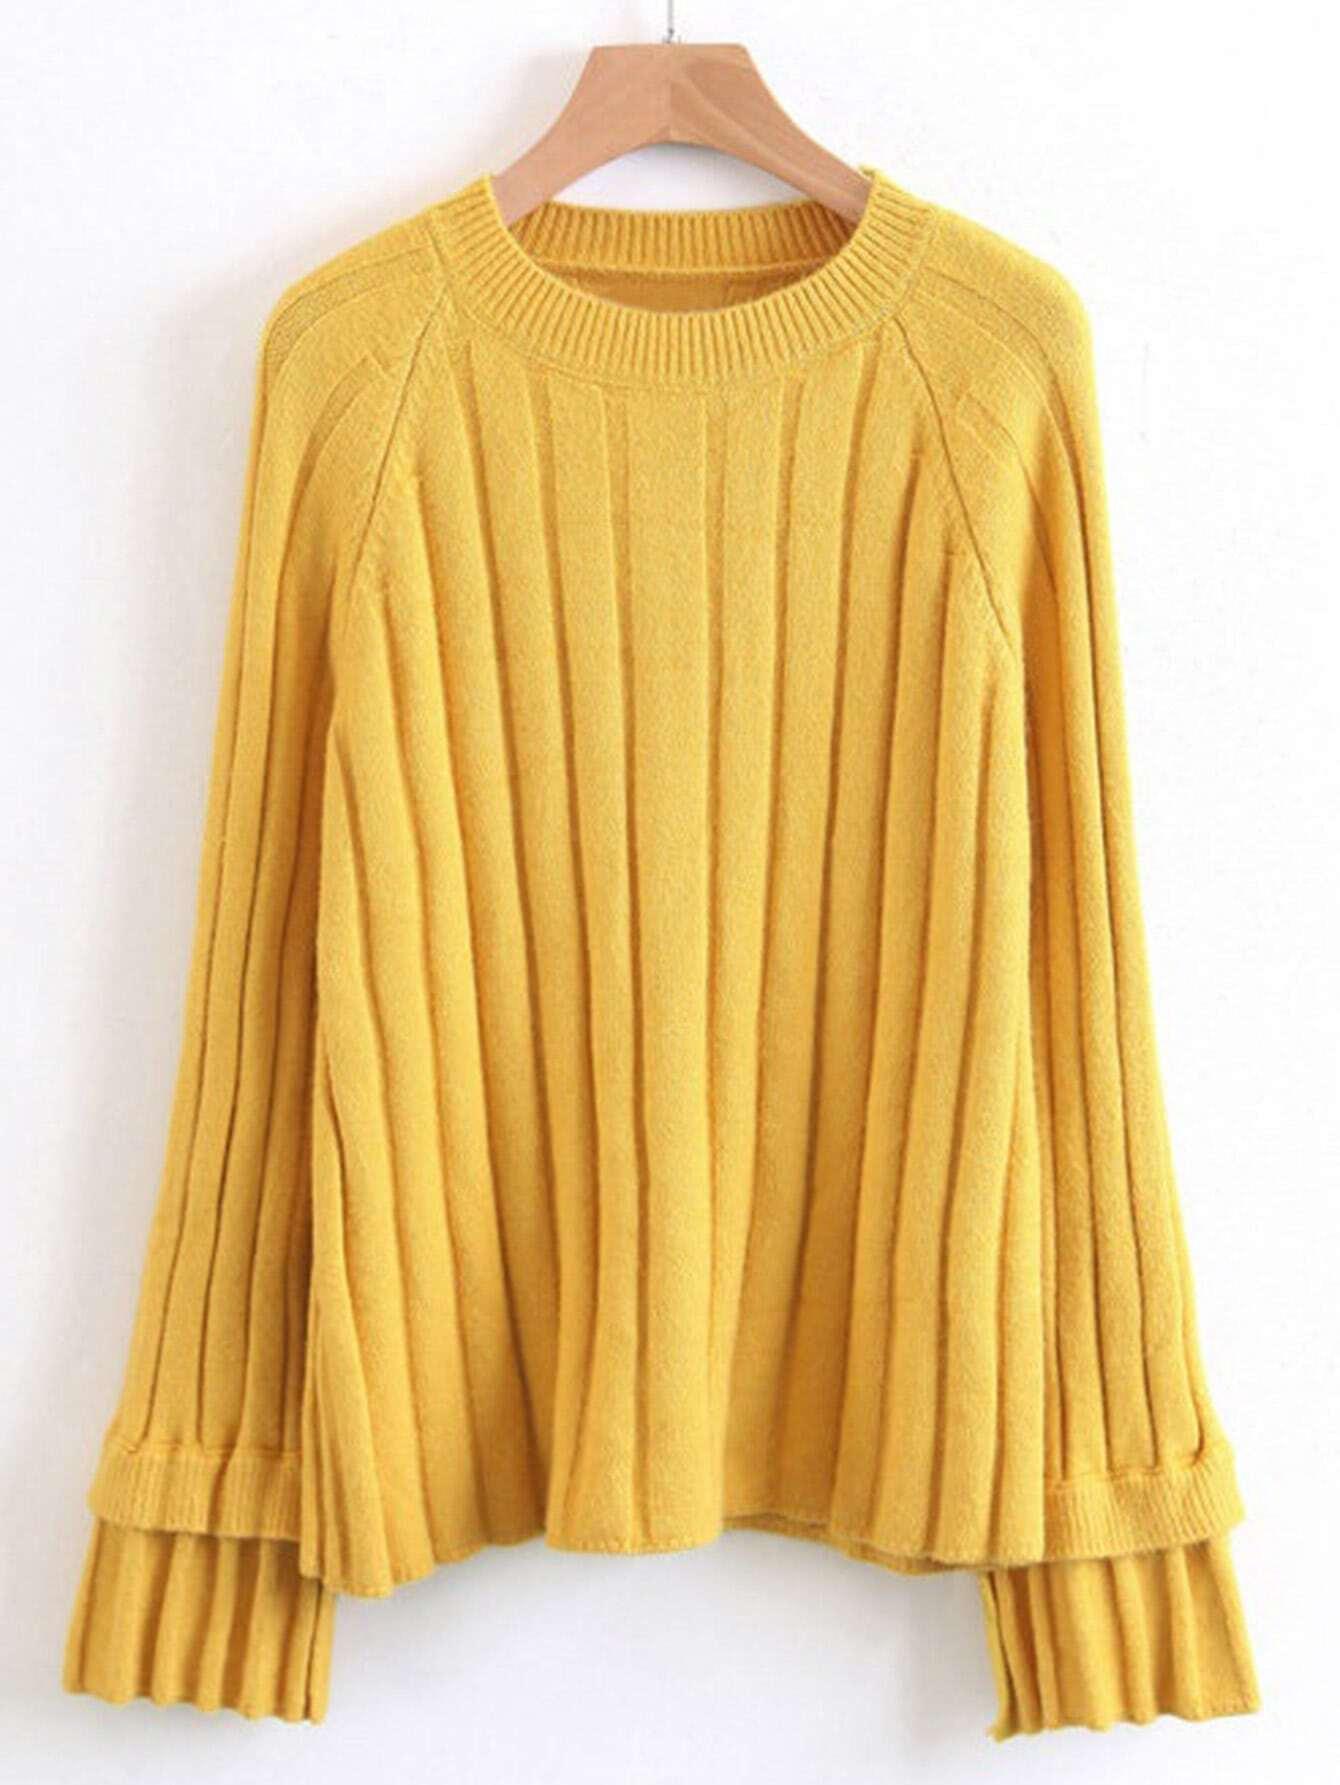 Tied Cuff Raglan Sleeve Ribbed Knitwear rkni170915211